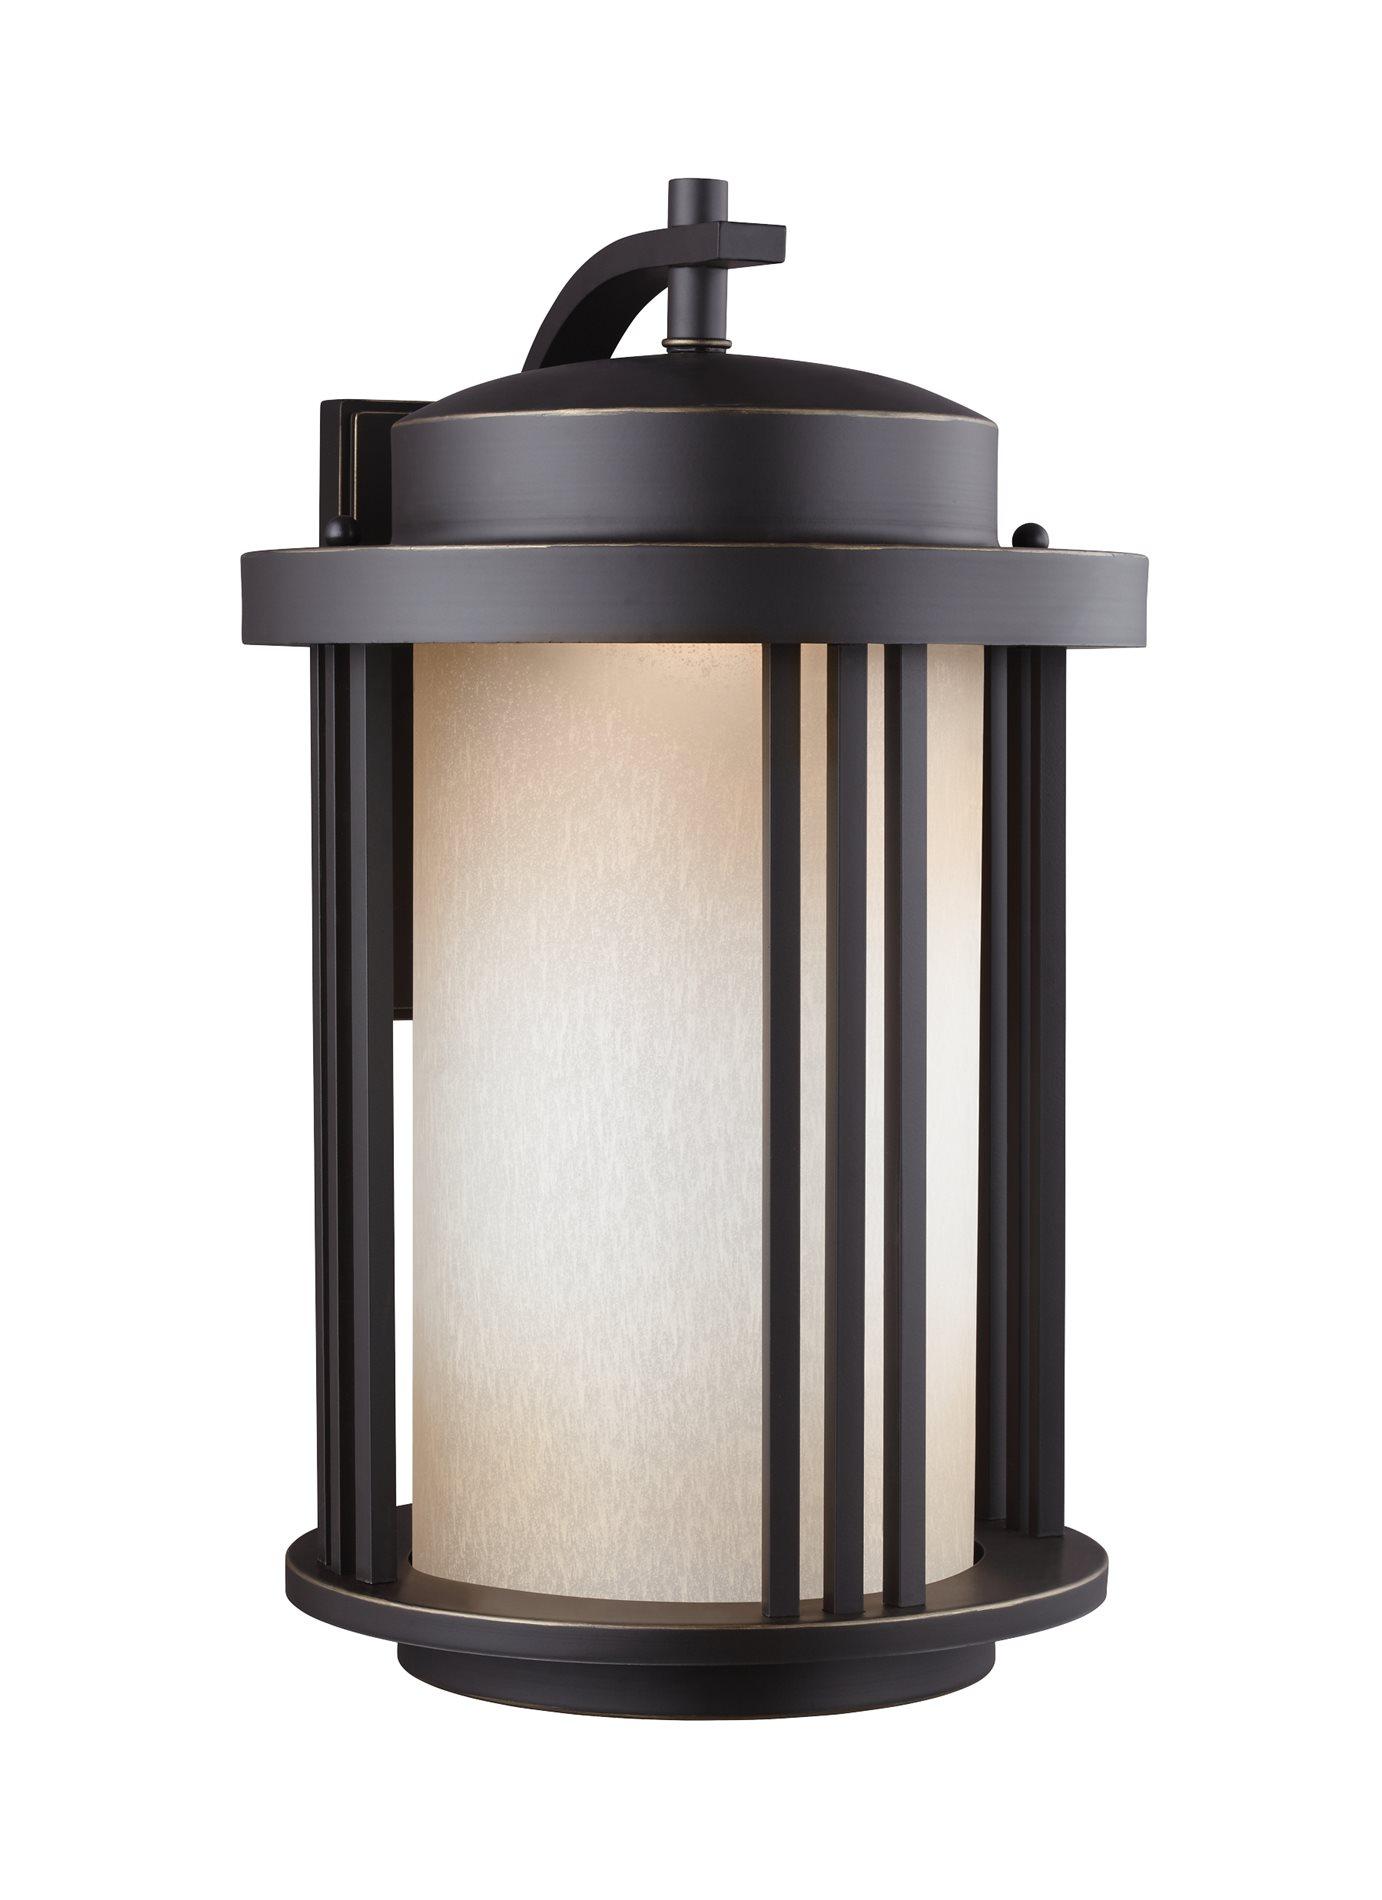 Sea Gull Lighting 8847991S 71 Crowell Modern Contemporary Lamp SG 8847991S 71